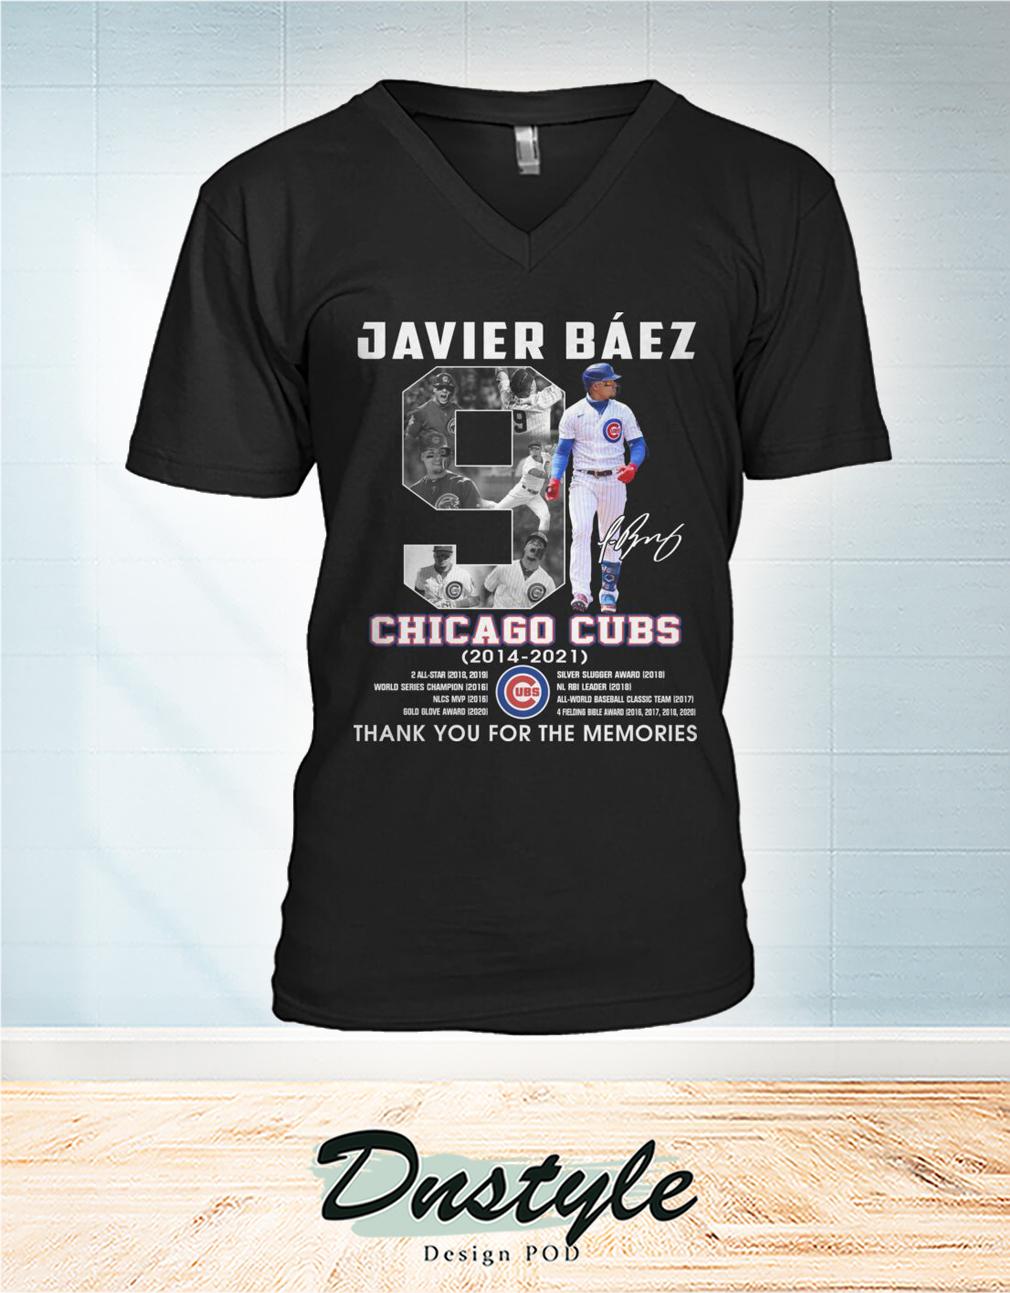 Chicago cubs Javier Báez 9 signature thank you for the memories v-neck